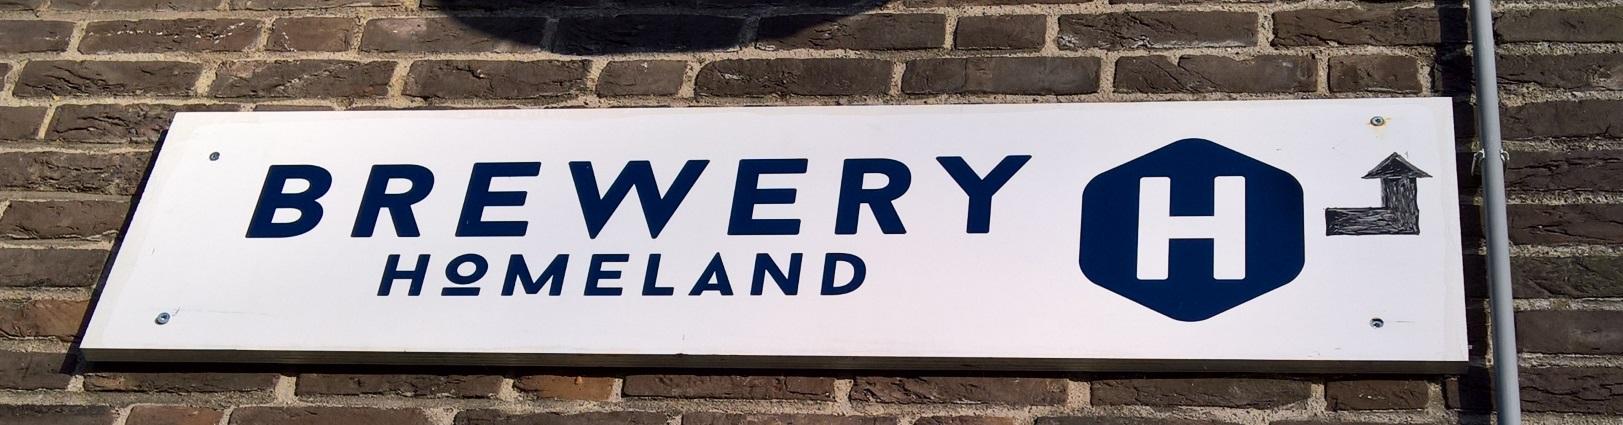 Homeland Brewery, Amsterdam